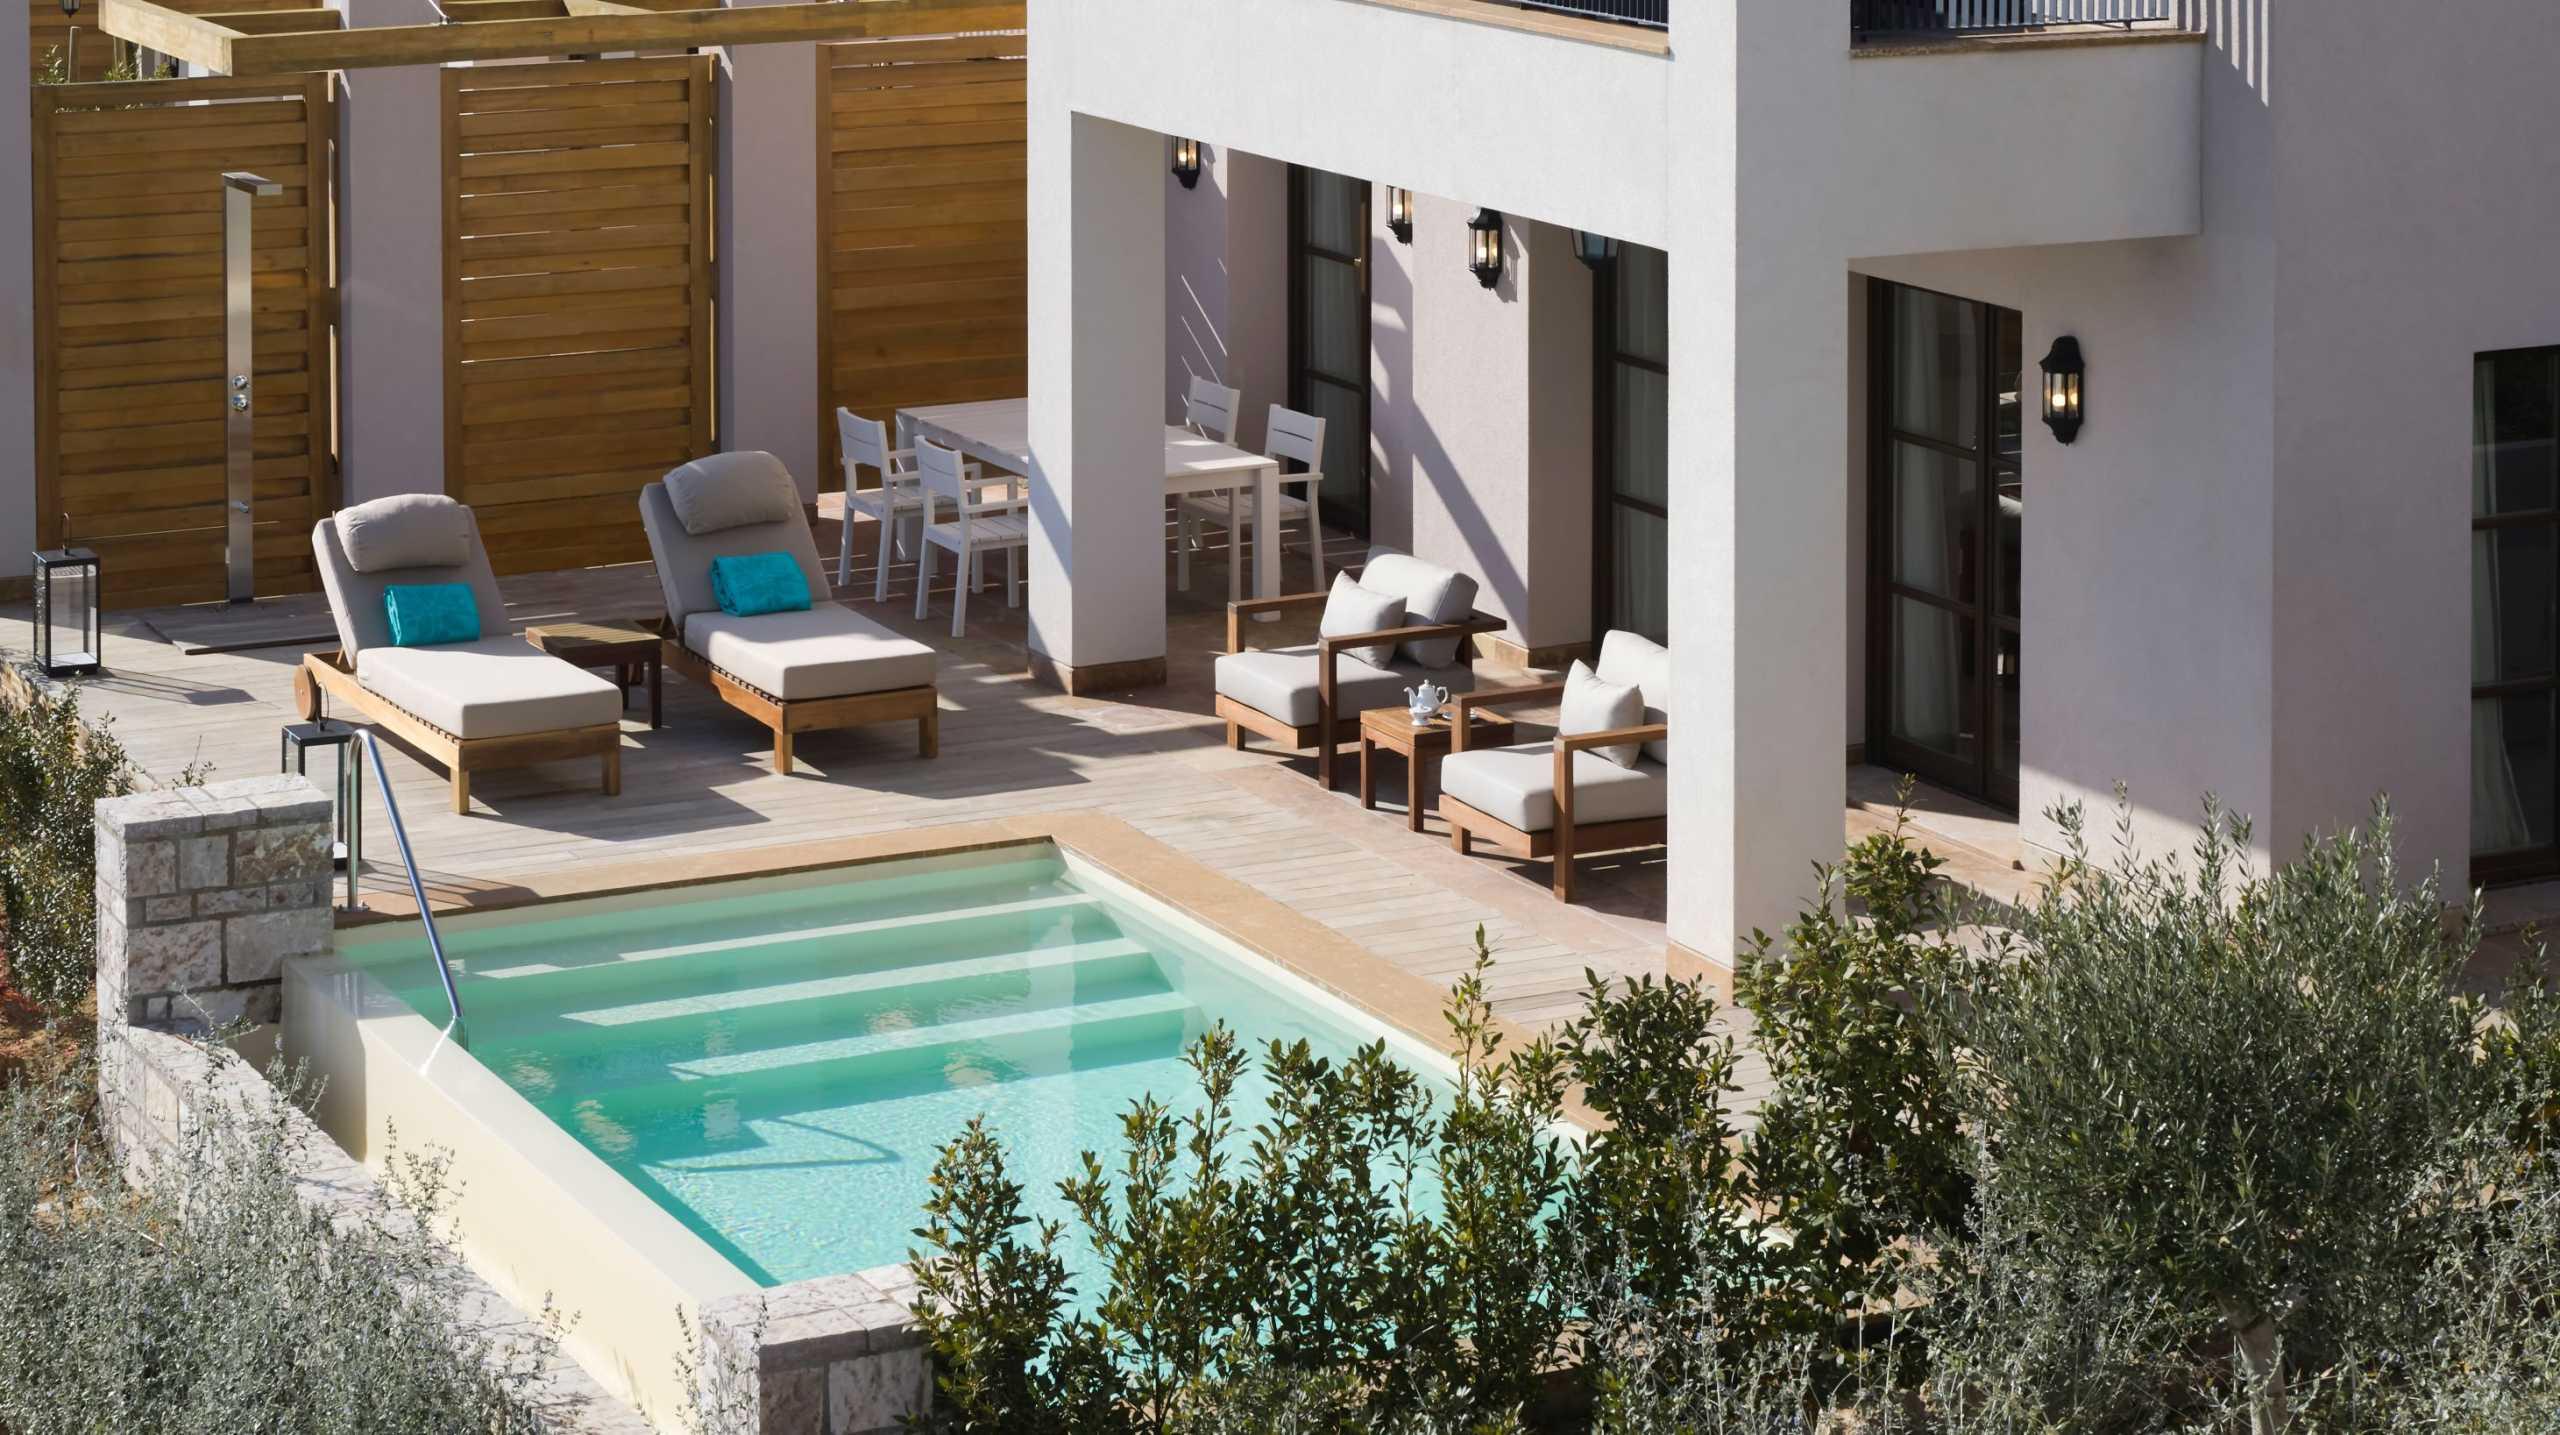 Banyan Tree: Το πρώην San Stefano στην Κέρκυρα μετατρέπεται στο πρώτο ευρωπαϊκό resort της διεθνούς ξενοδοχειακής αλυσίδας